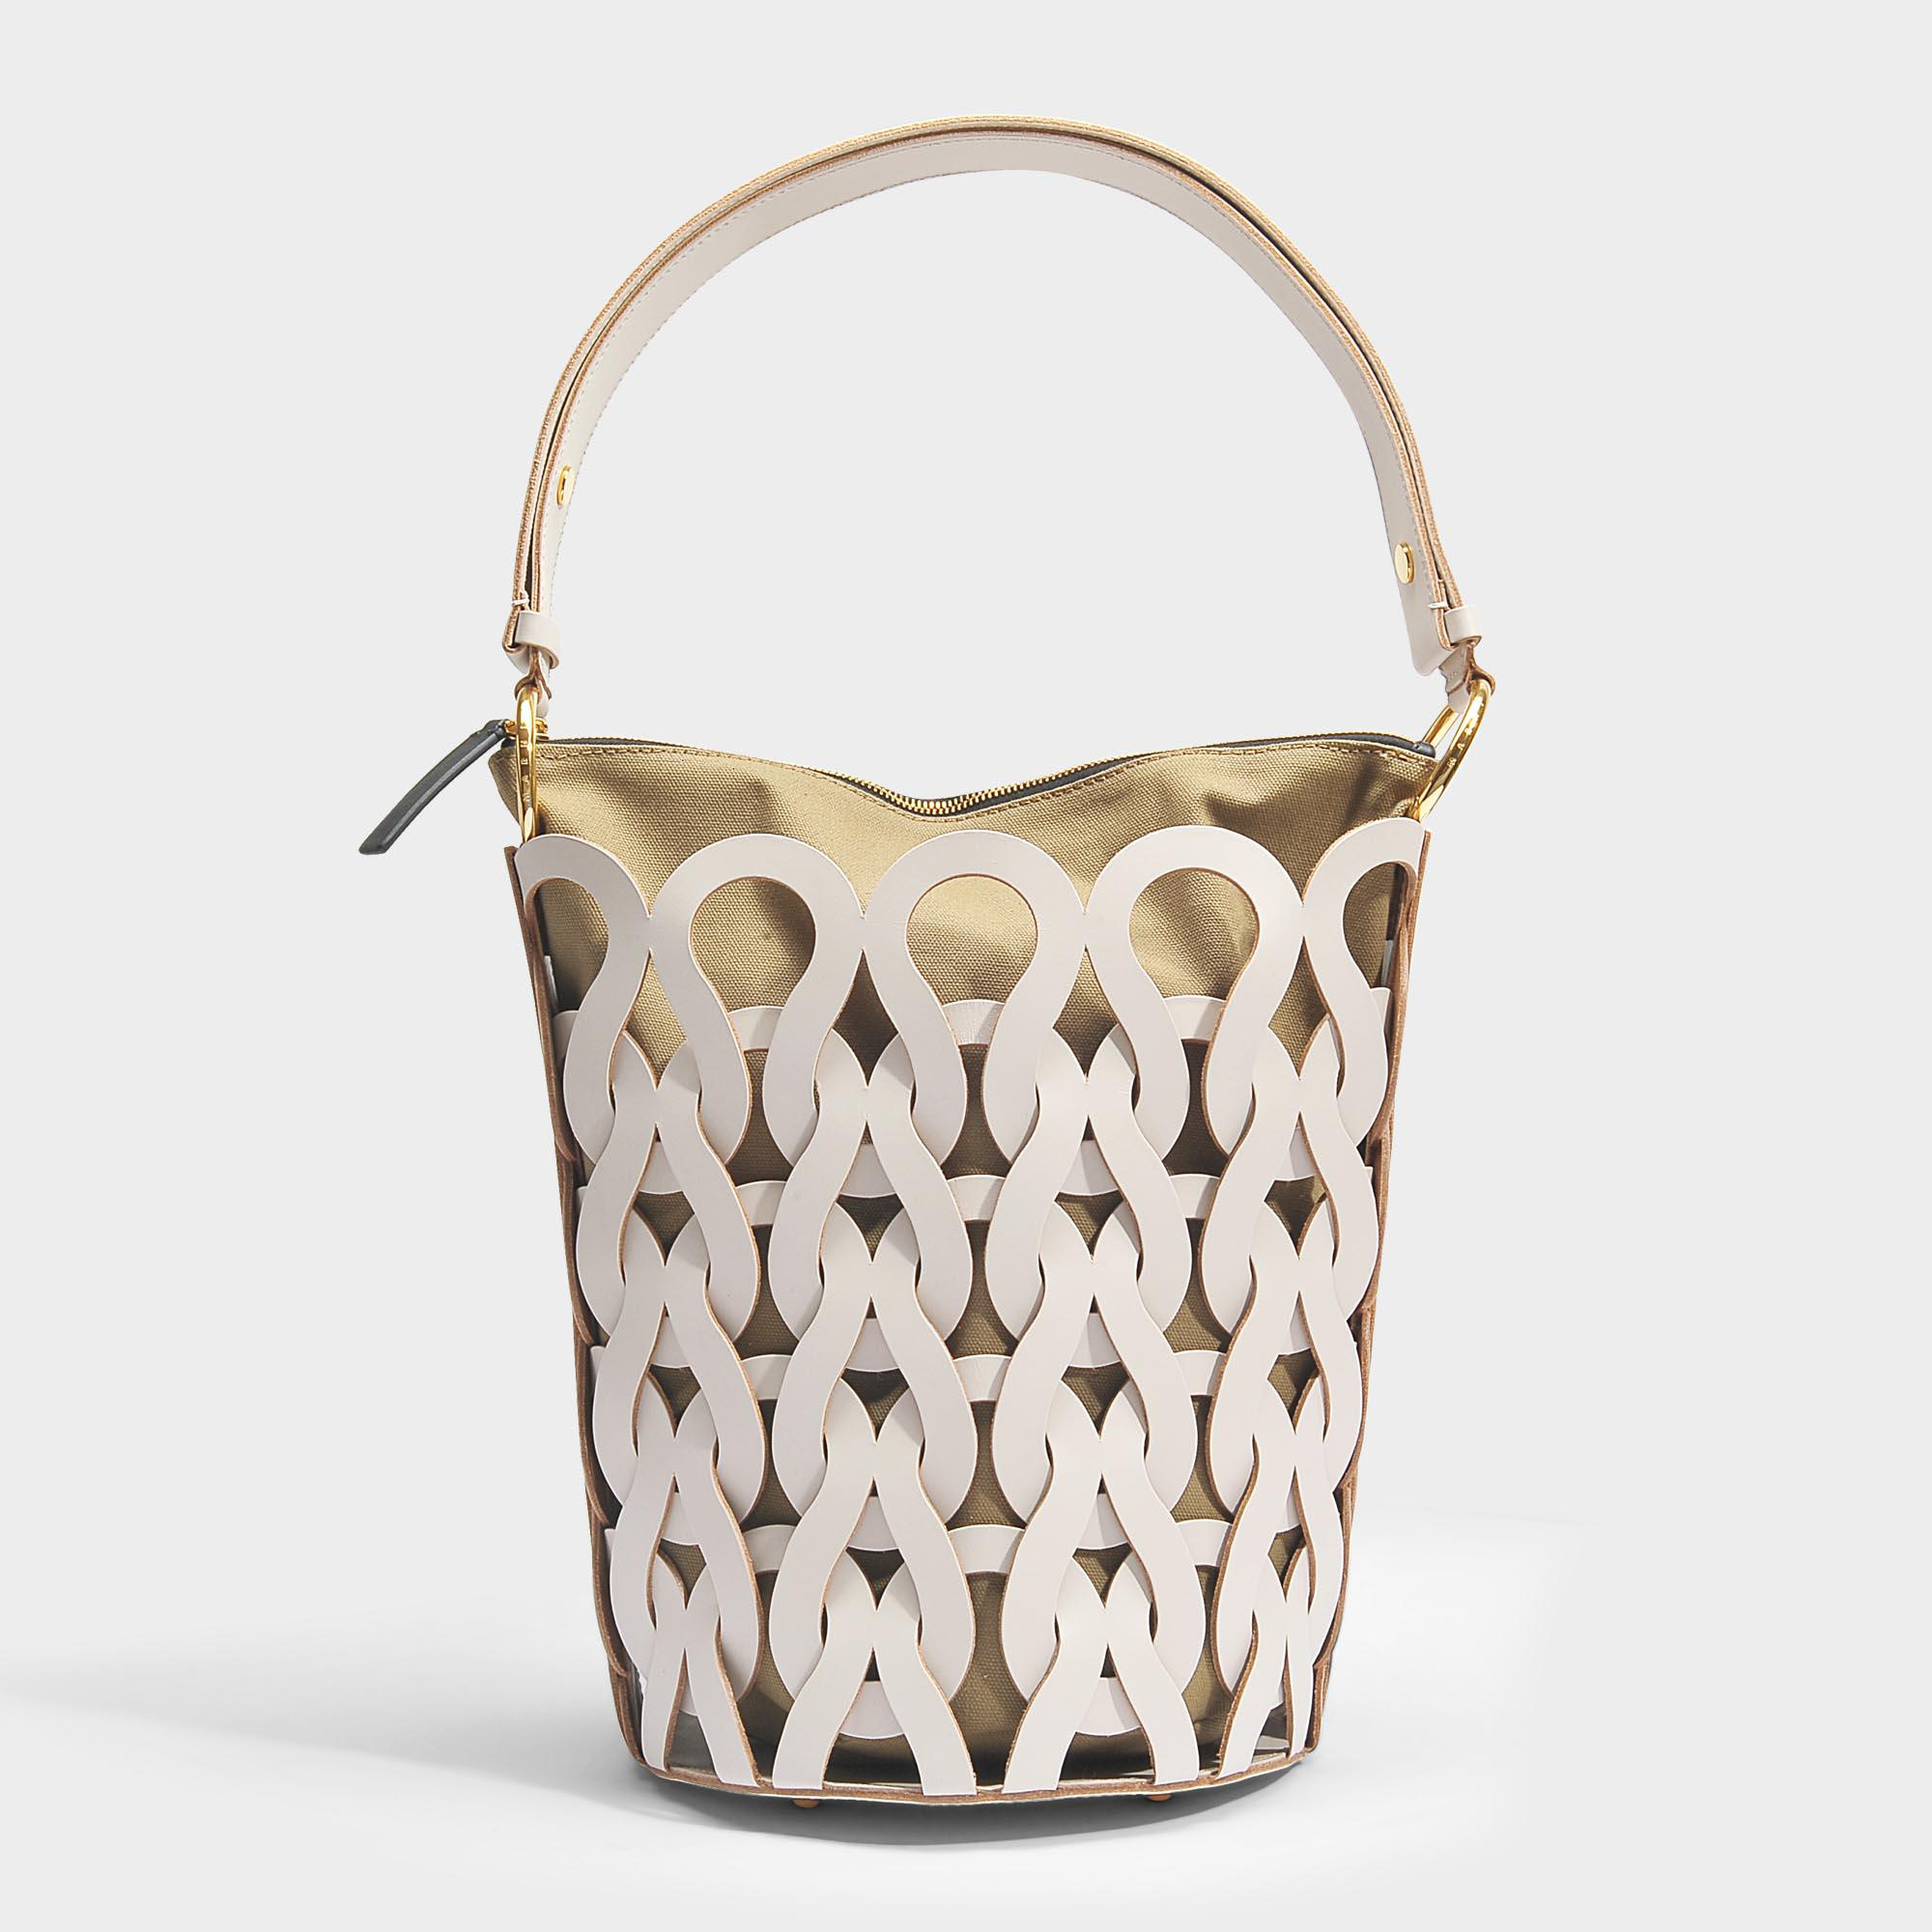 Trico Bucket Bag in Glass Calfskin Marni vVeLcufXf0